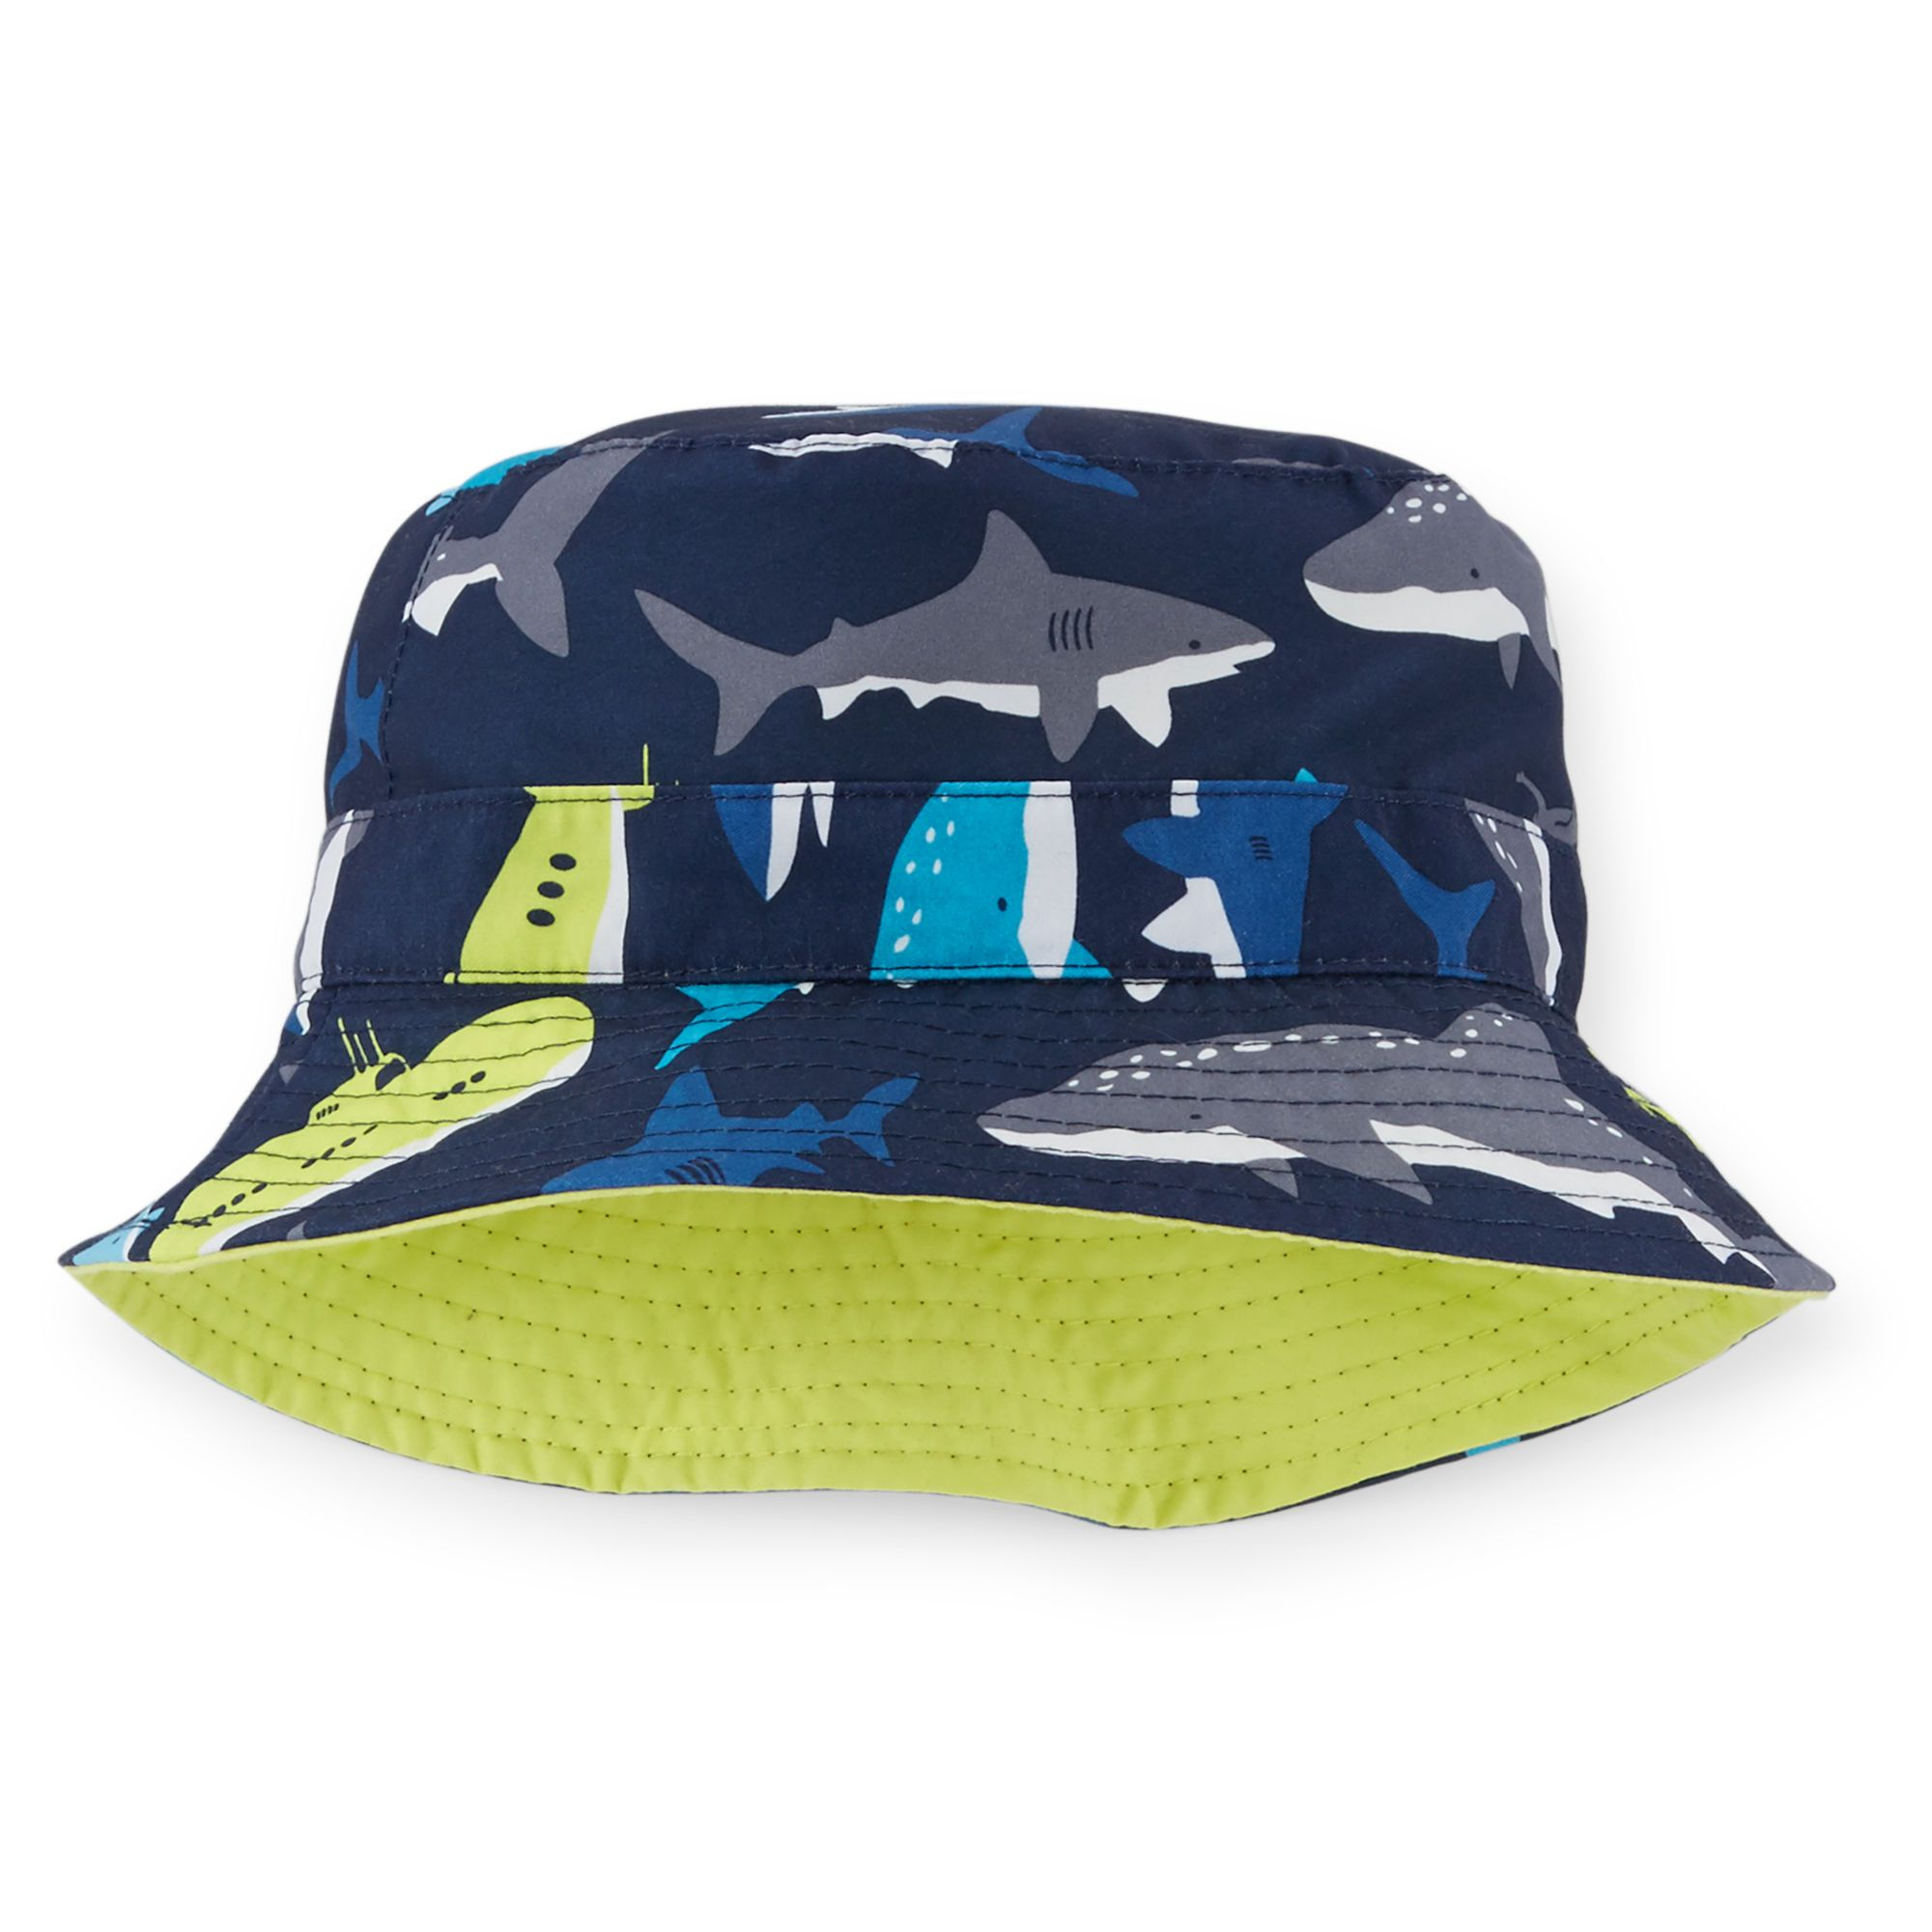 d0785992353 Toddler Boy Reversible Shark Print Bucket Hat